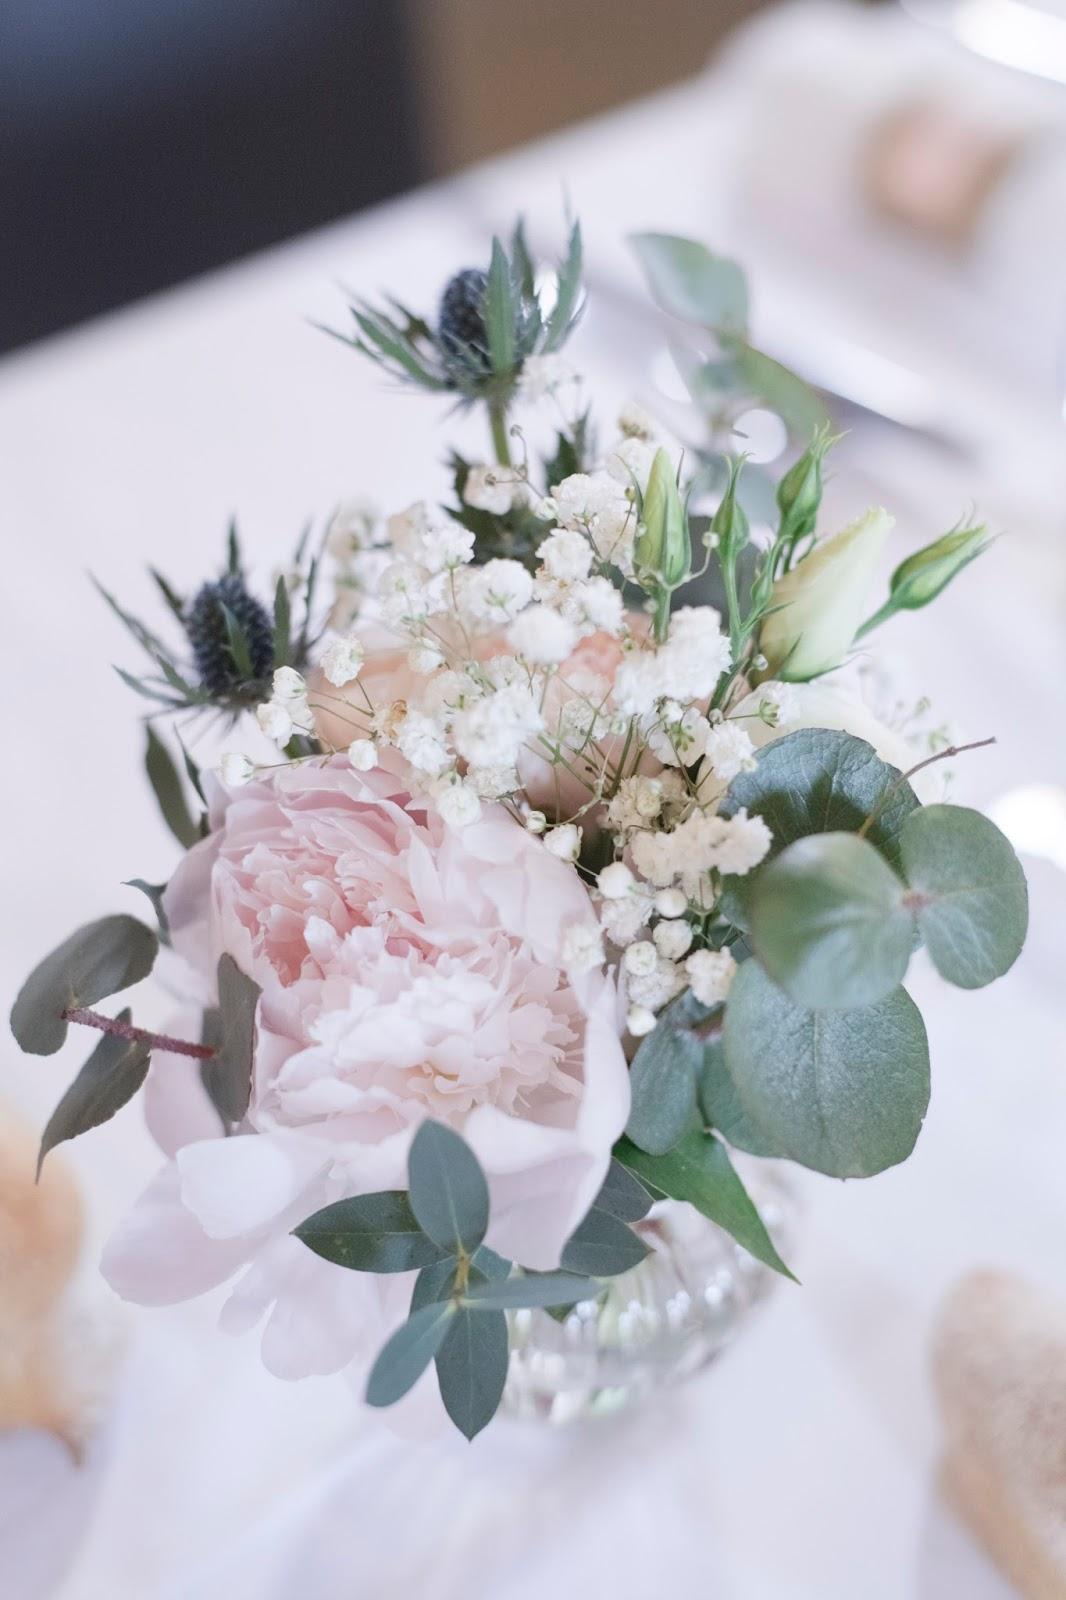 la petite boutique de fleurs fleuriste mariage lyon fleuriste mariage rh ne juin 2017. Black Bedroom Furniture Sets. Home Design Ideas